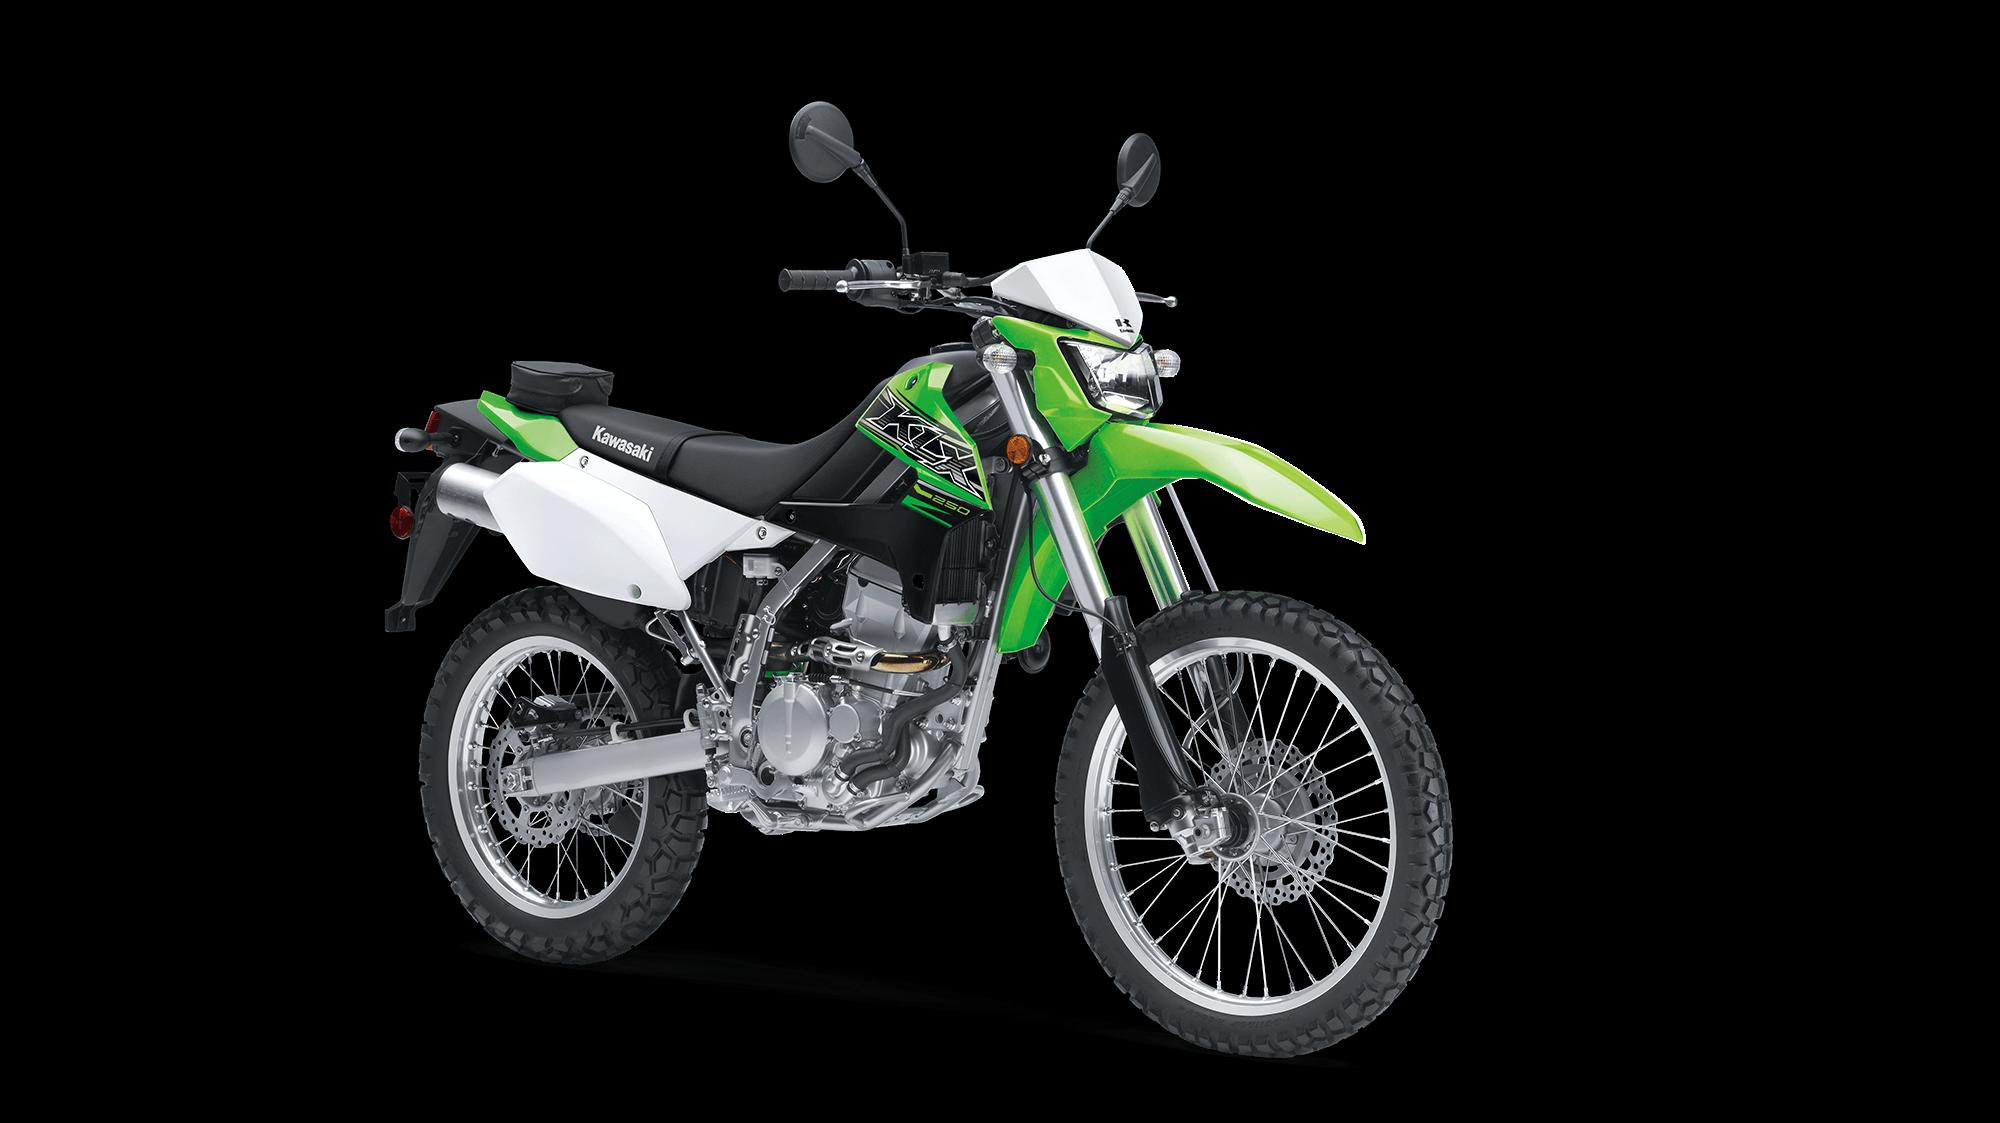 2019 KLX®250 KLR™/KLX® Motorcycle by Kawasaki